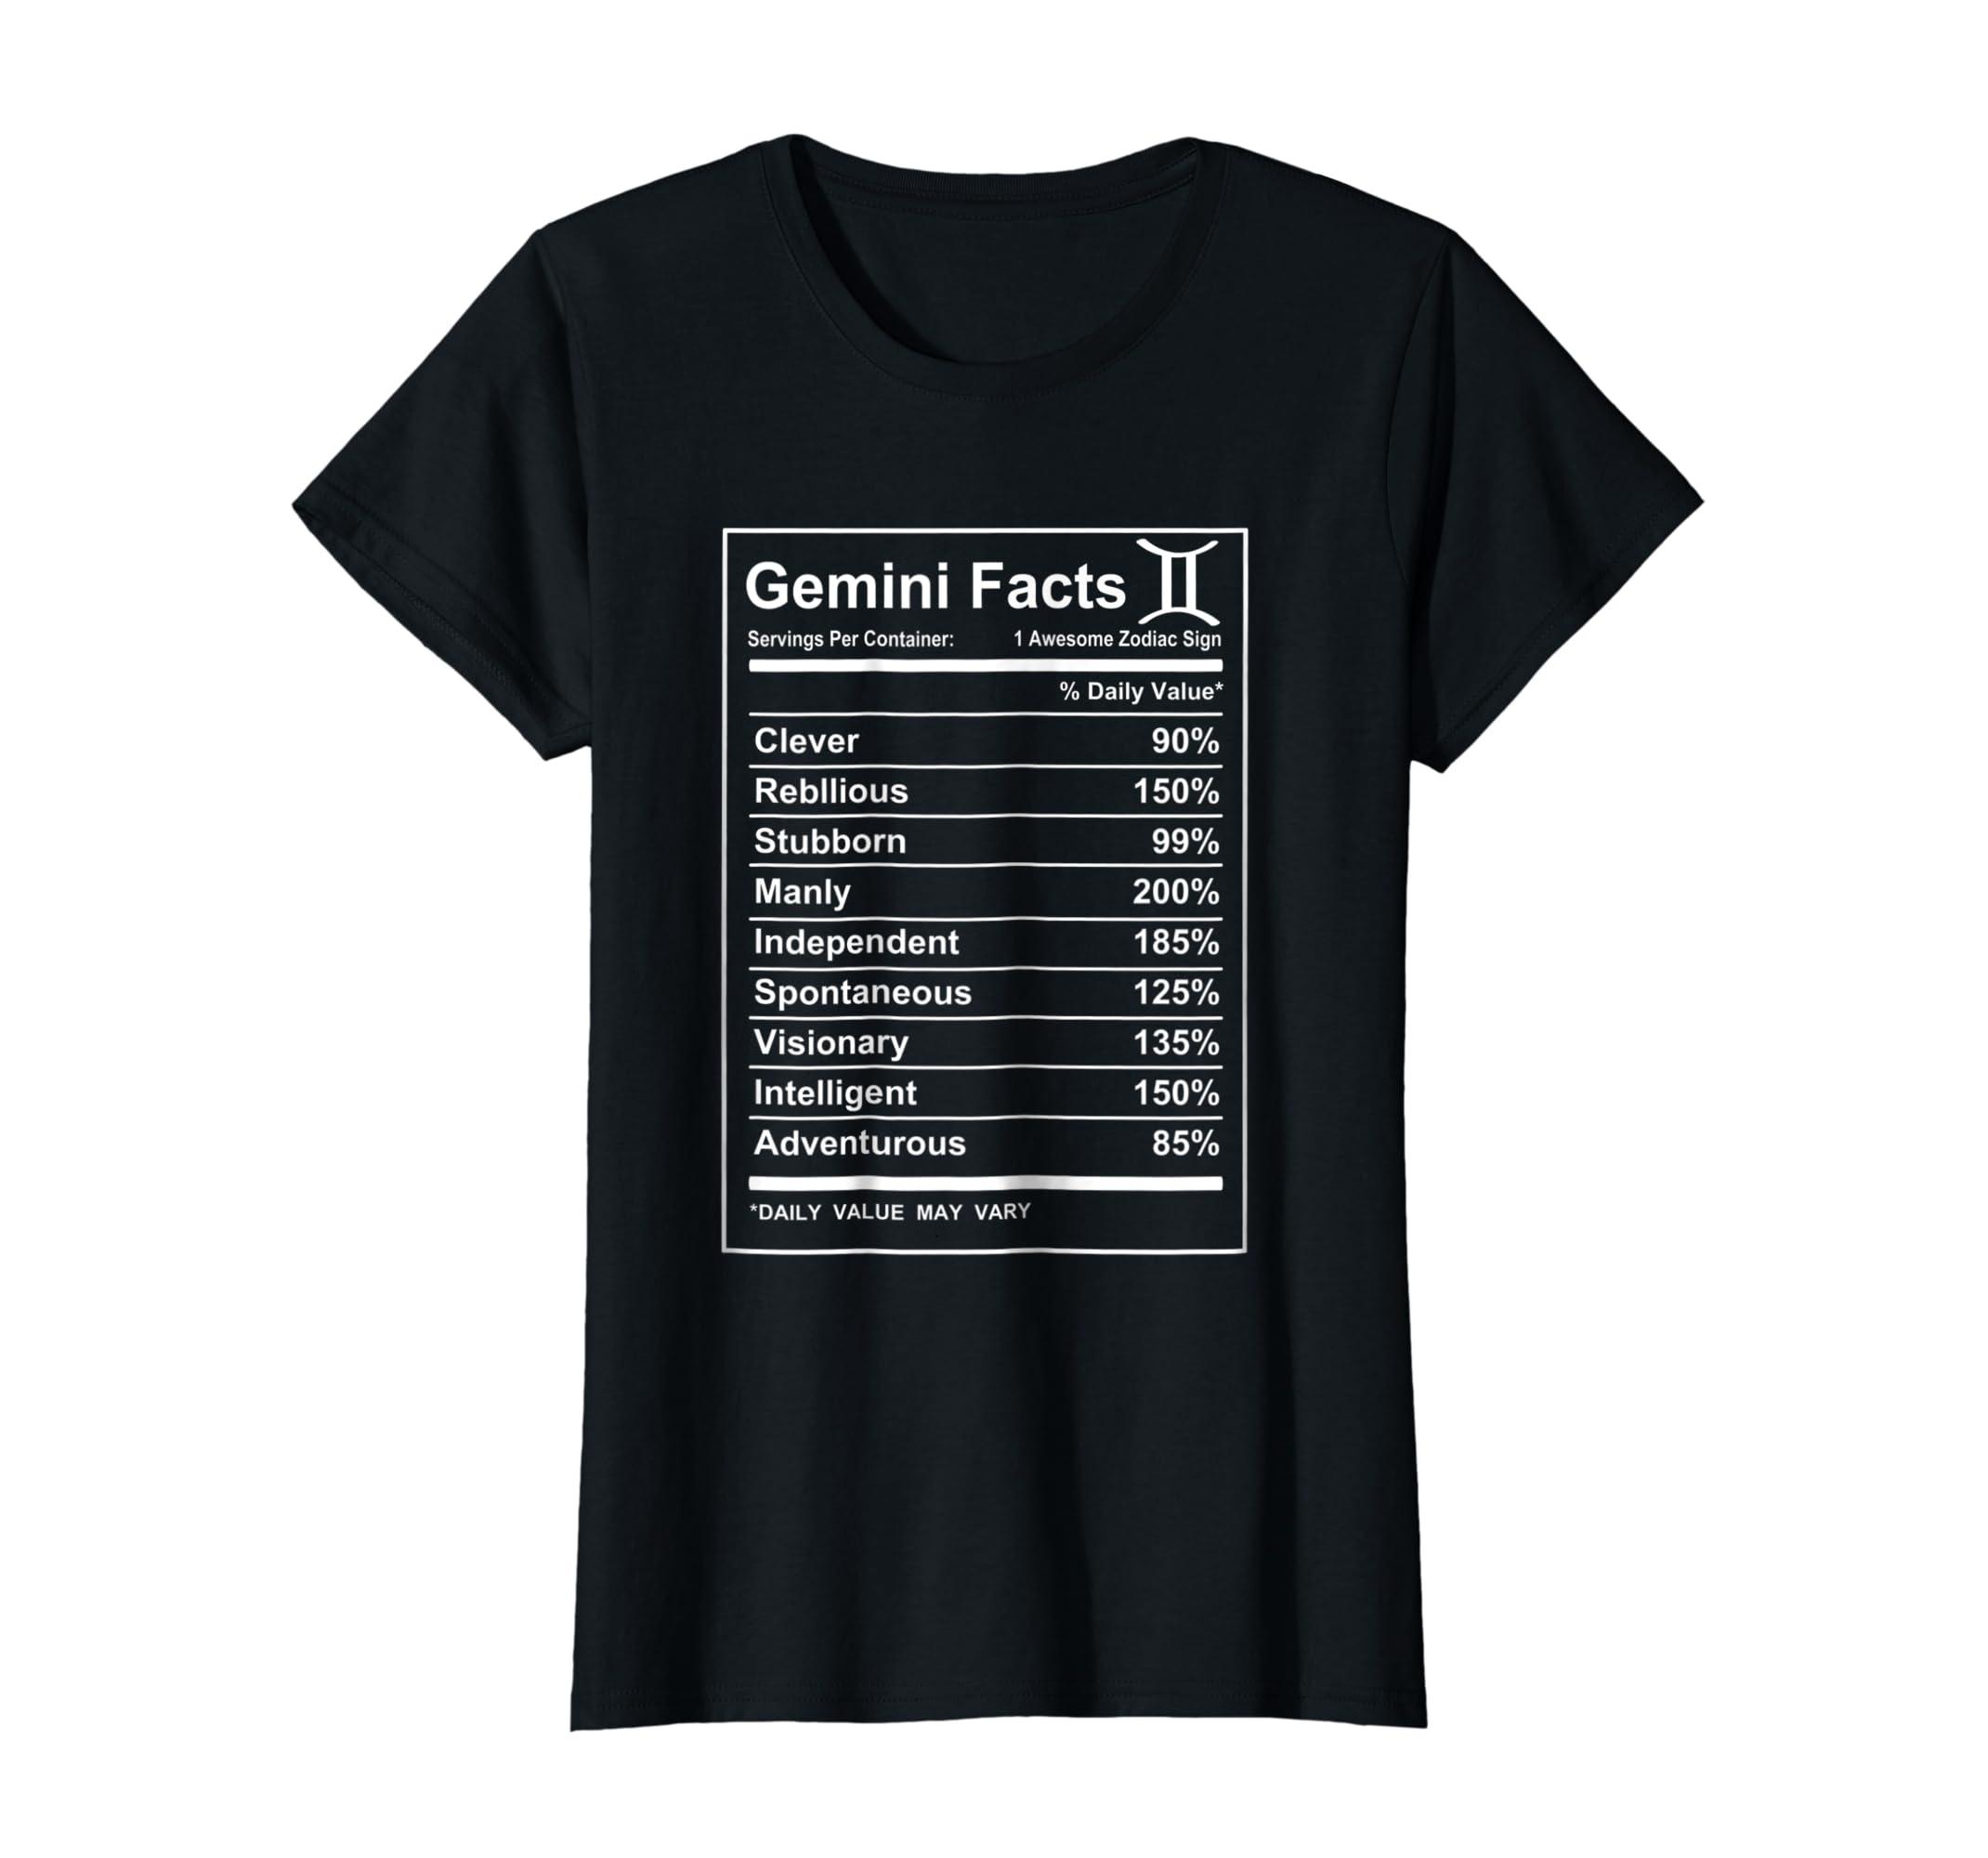 134c9d05fb Amazon.com: Gemini Facts - Funny Gemini zodiac T-shirt Cool short sleeve:  Clothing